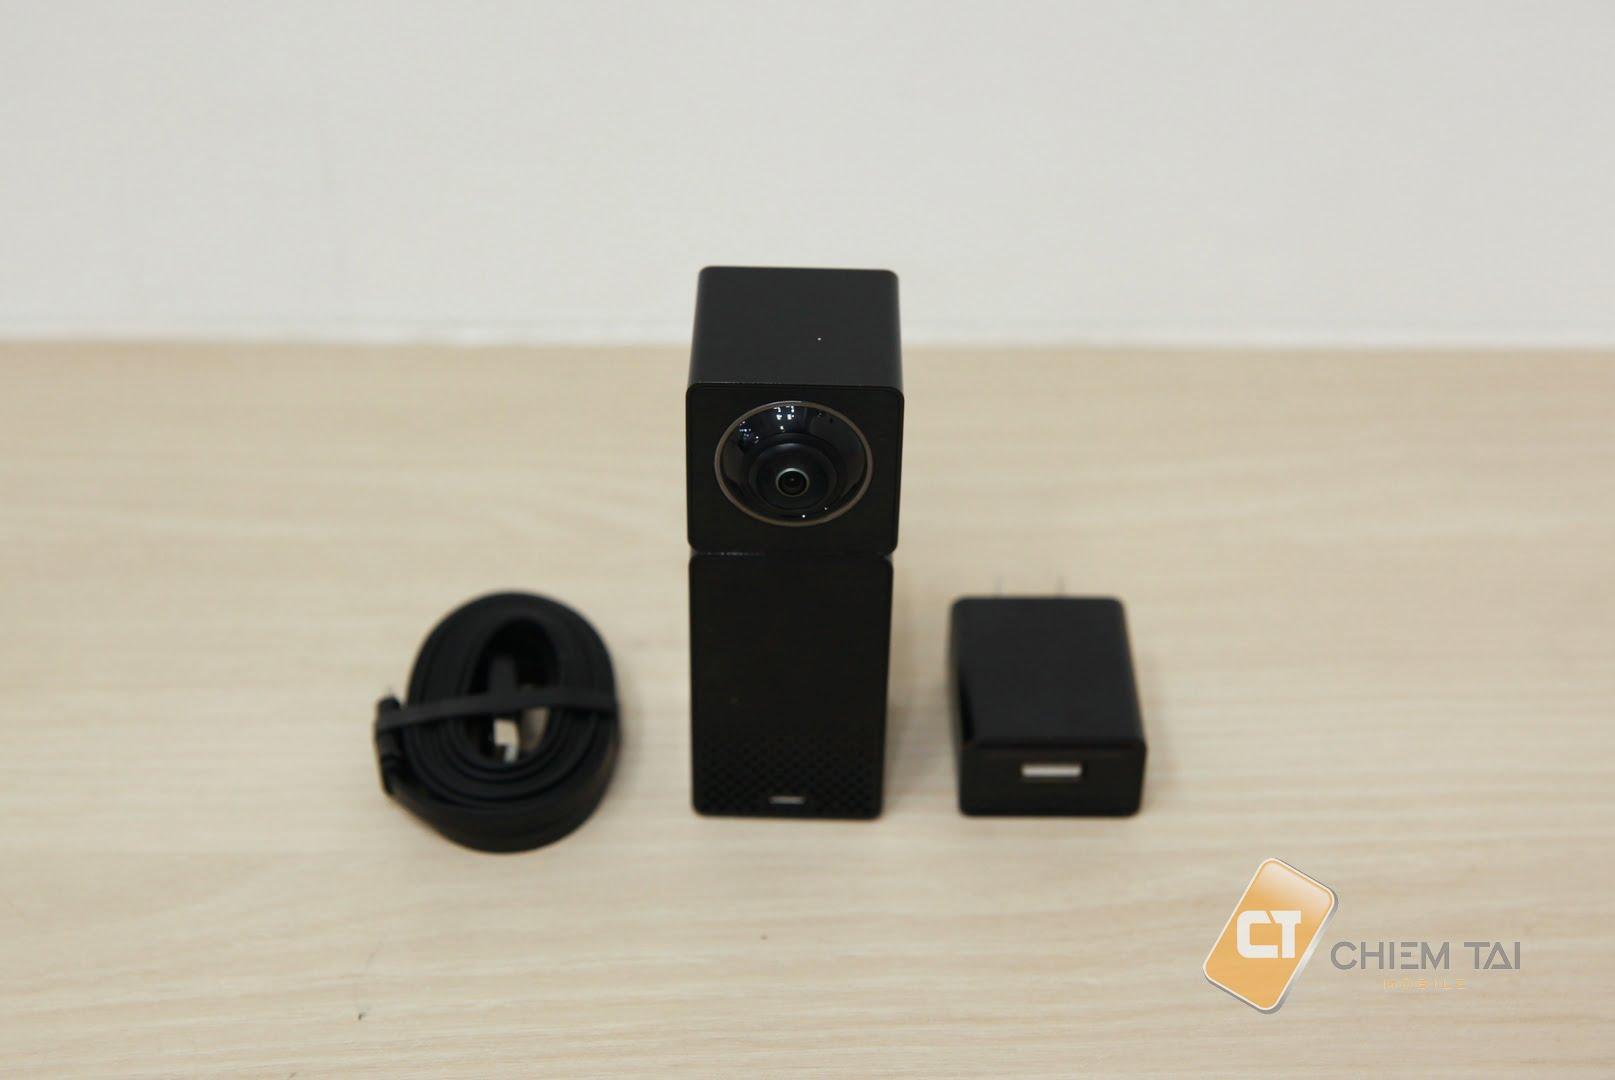 camera ip thong minh xiaofang qf3 360 do 6007d38b3f9f1